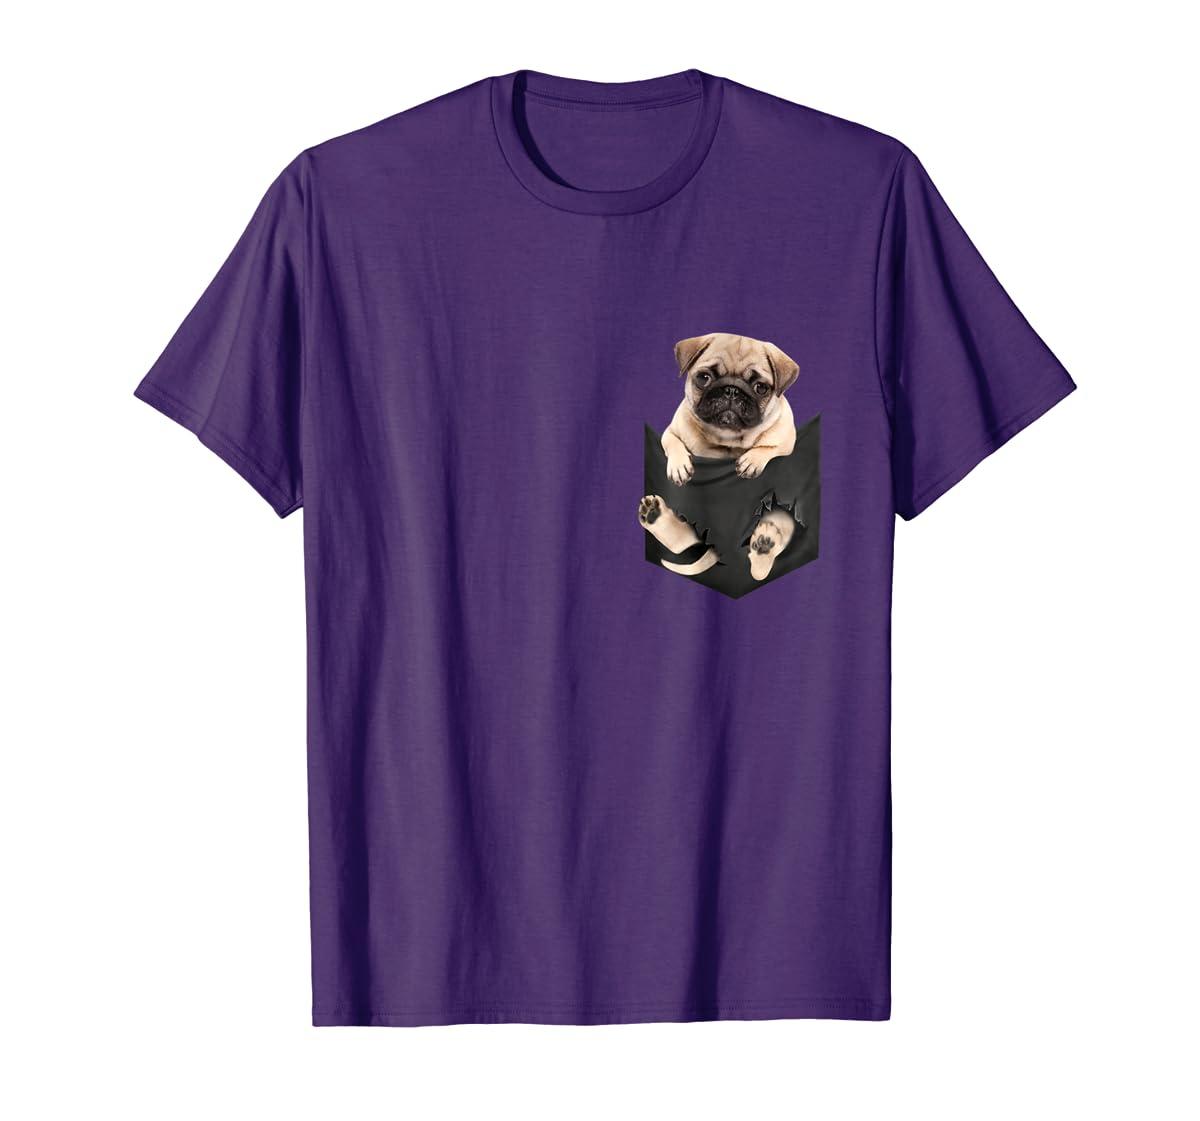 Dog in Your Pocket santa hat pug lover gift shirt-Men's T-Shirt-Purple